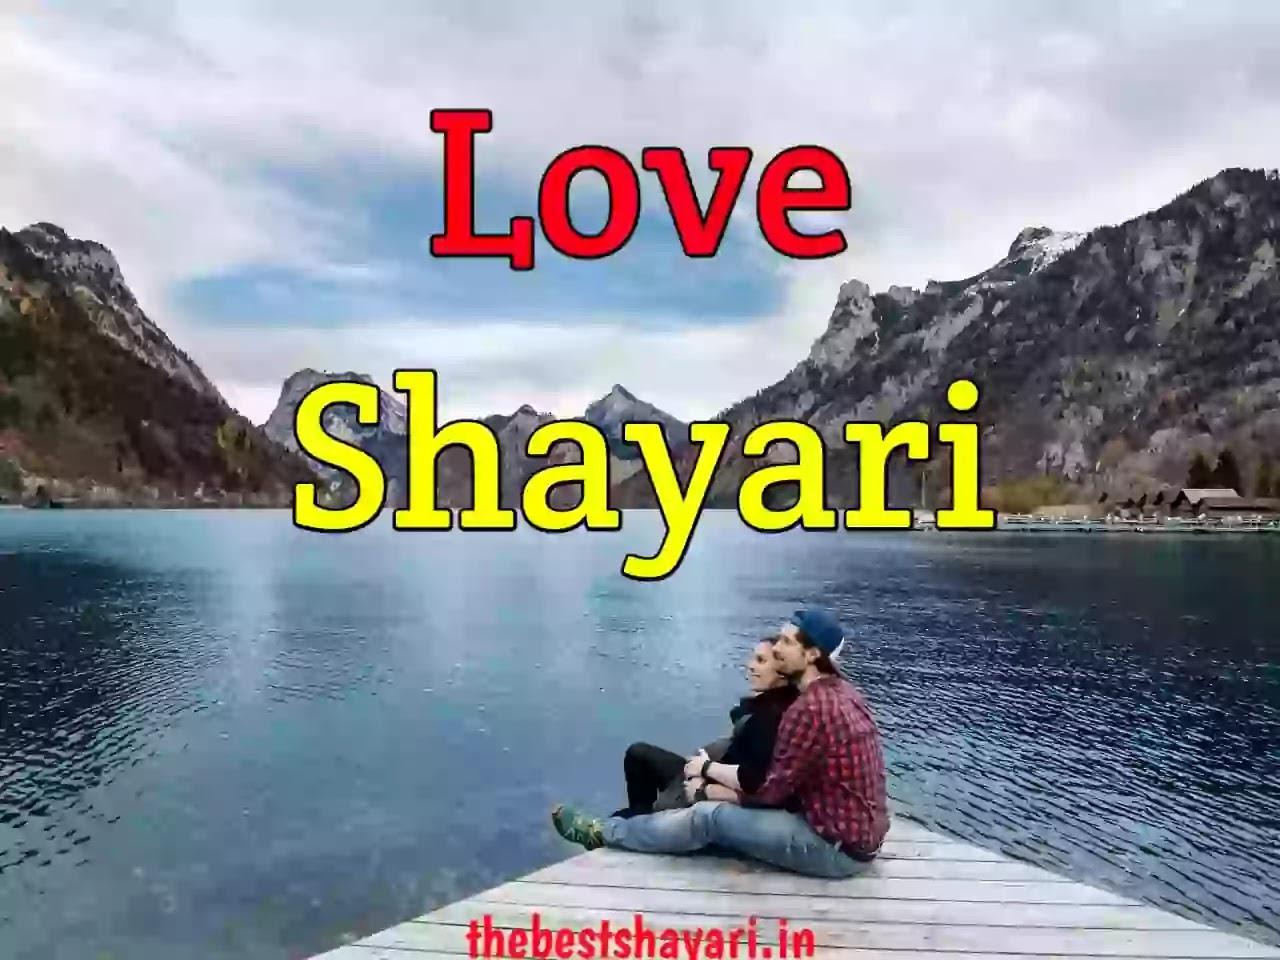 romantic Love shayari with images